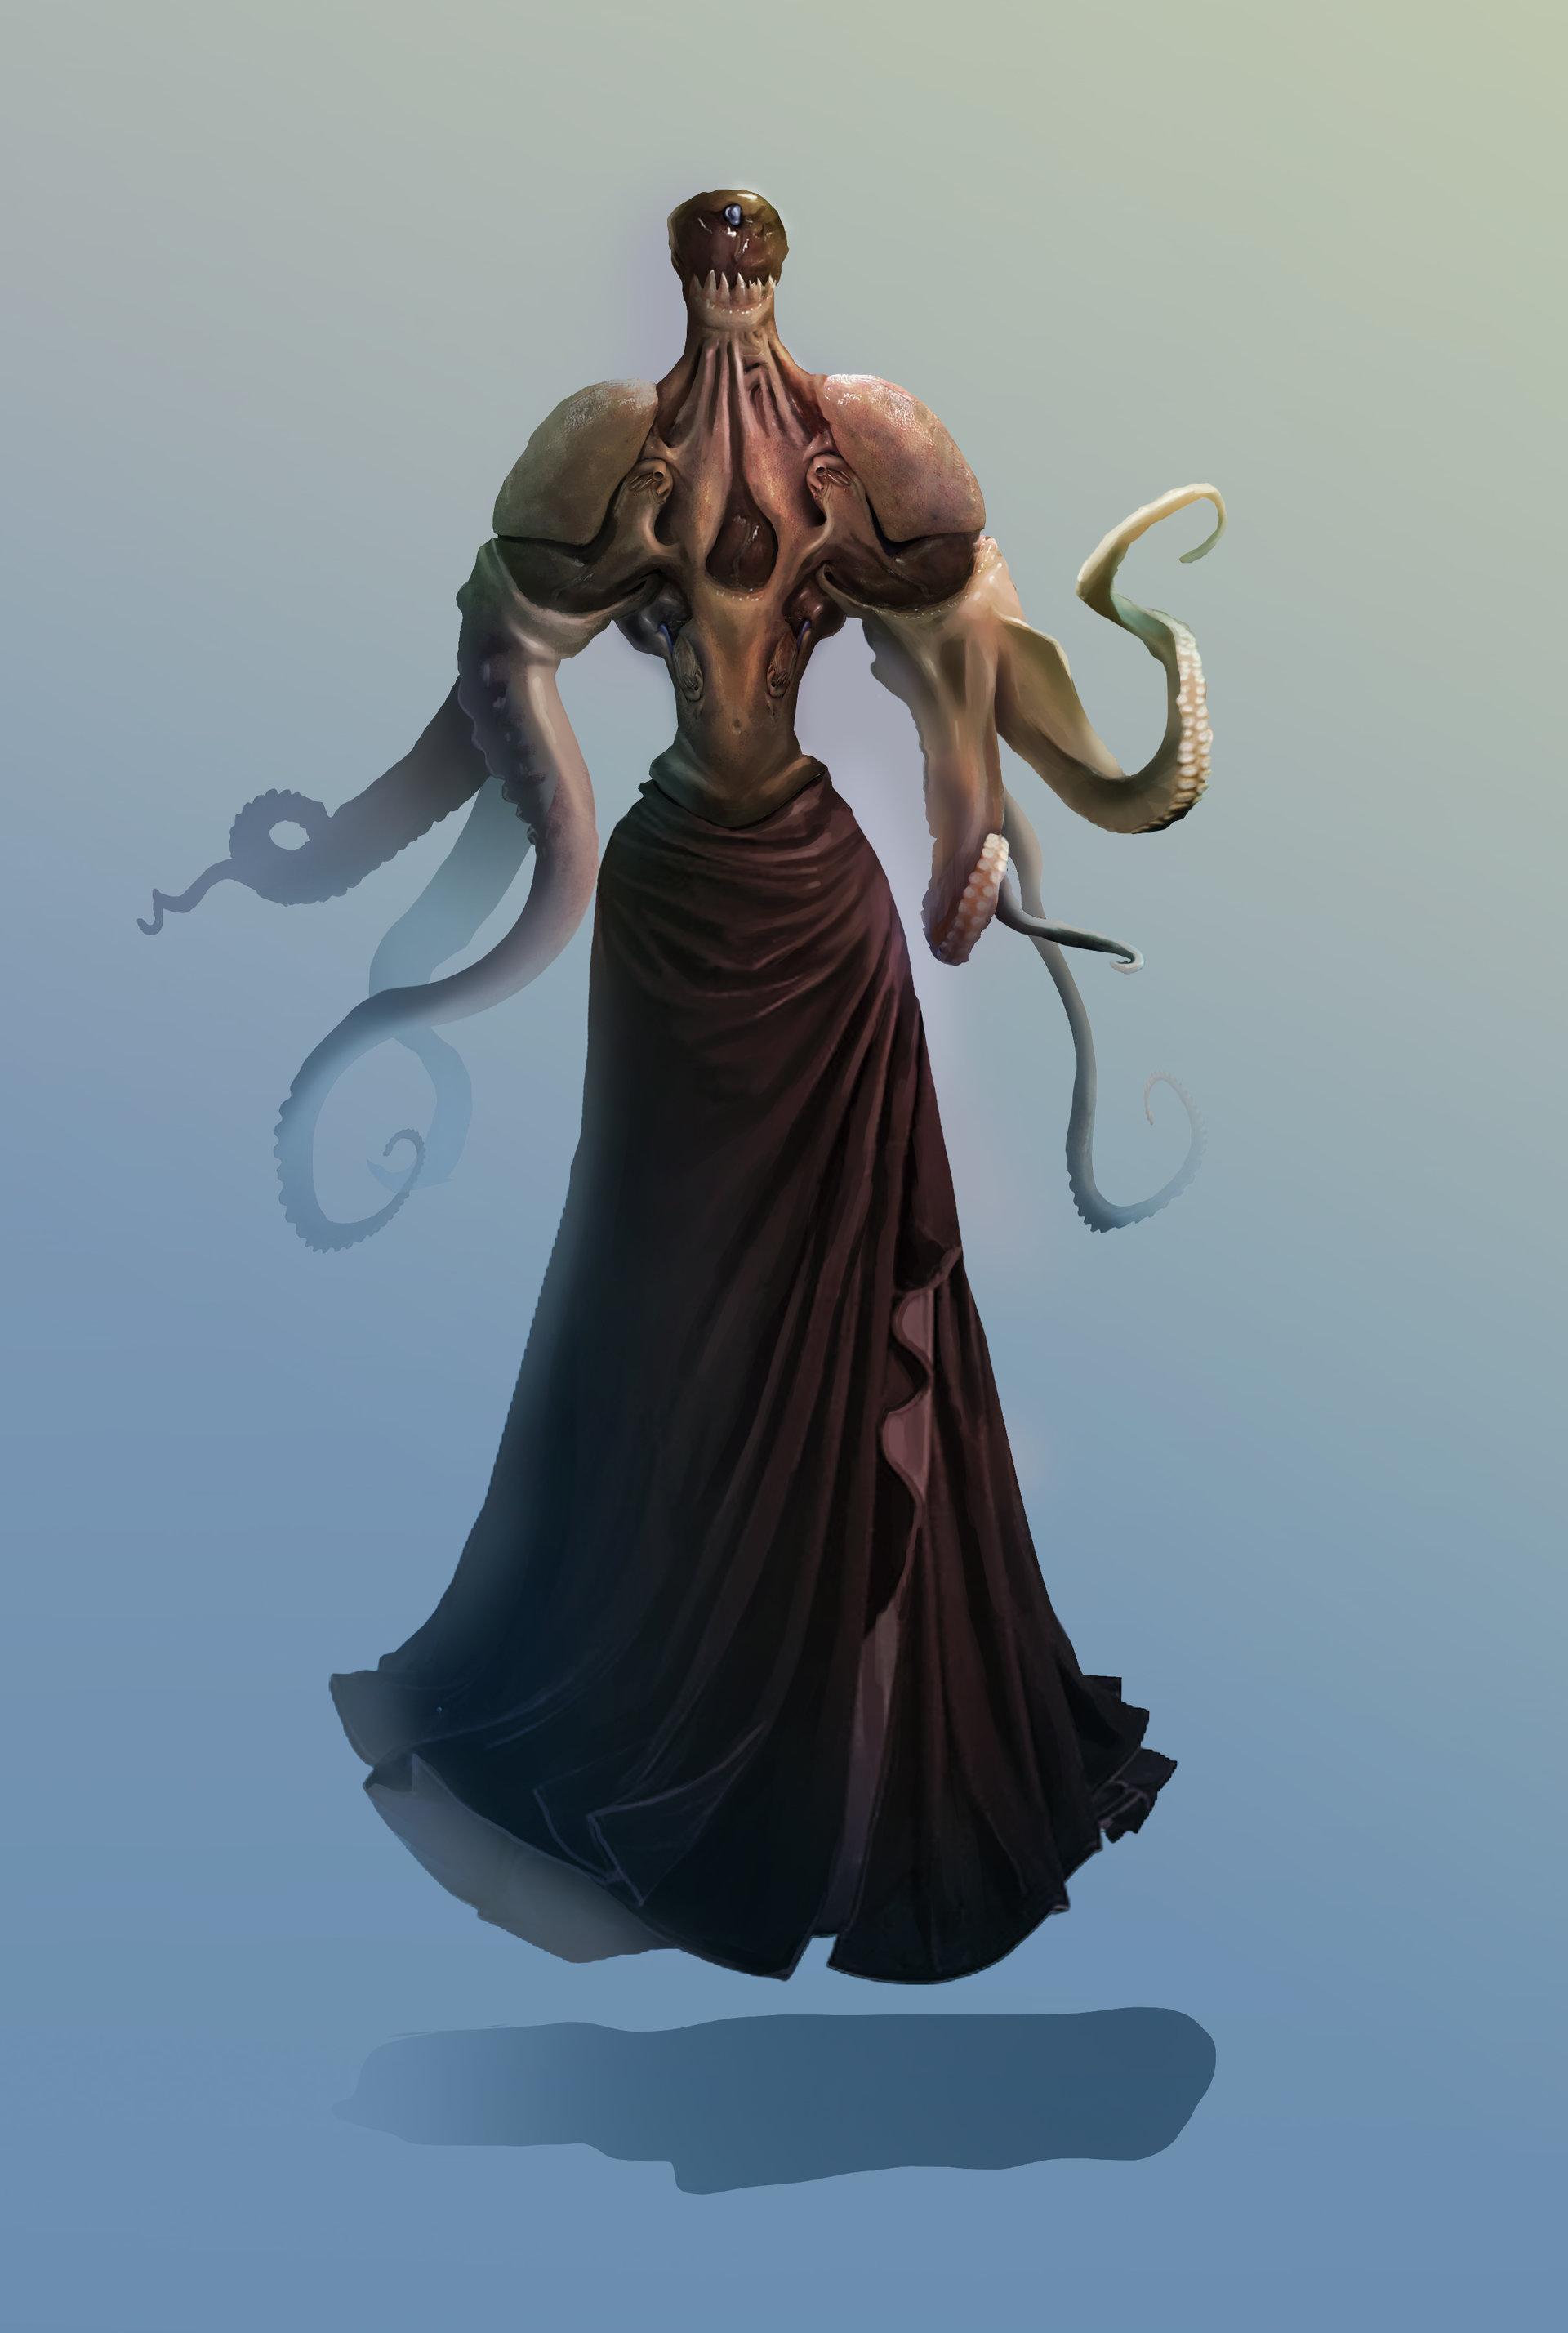 Hntrung alien priest